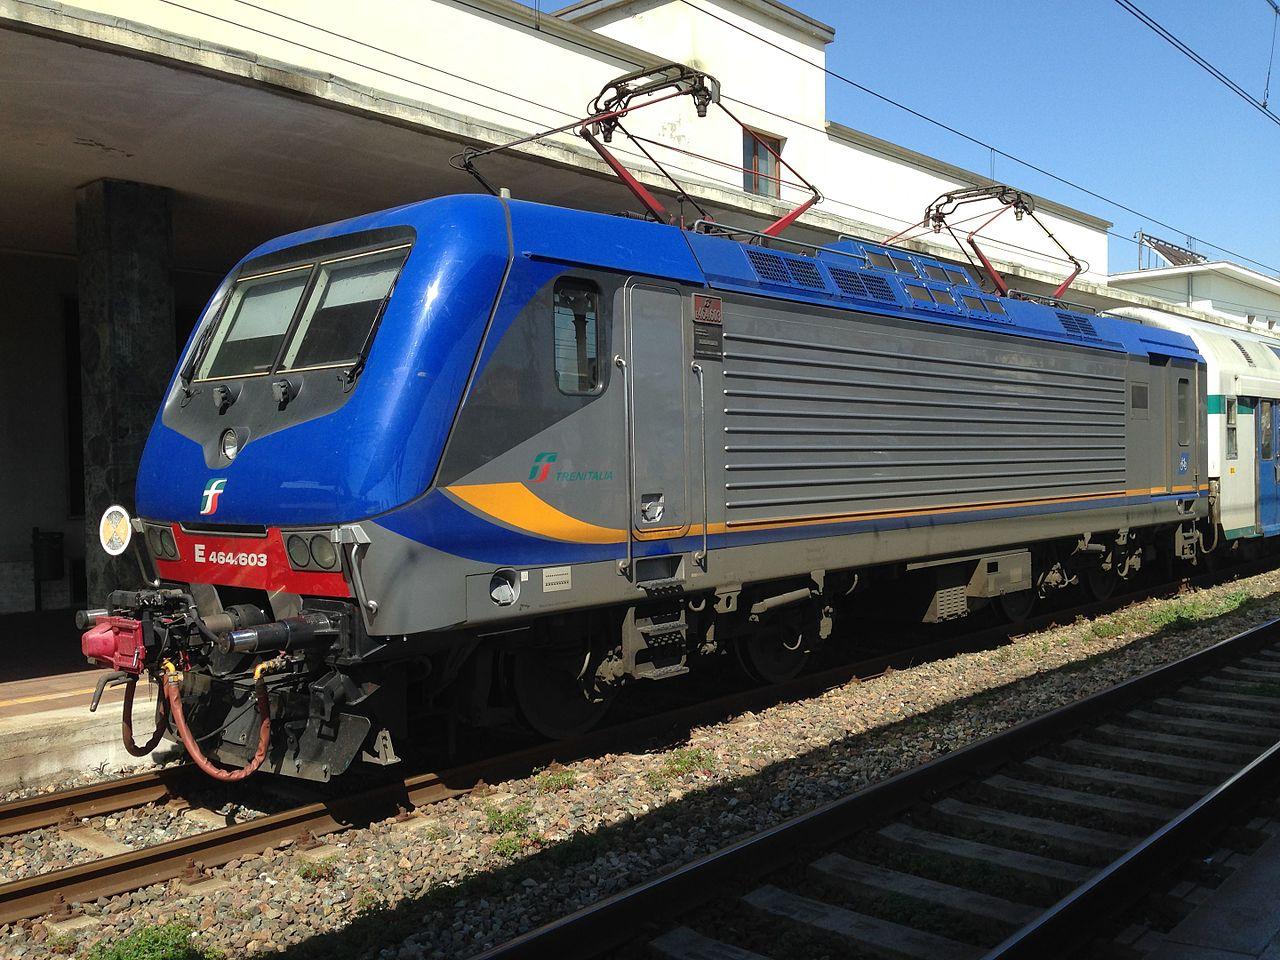 Vehicle - Rail - Locomotive - Electric - FS Class E.464